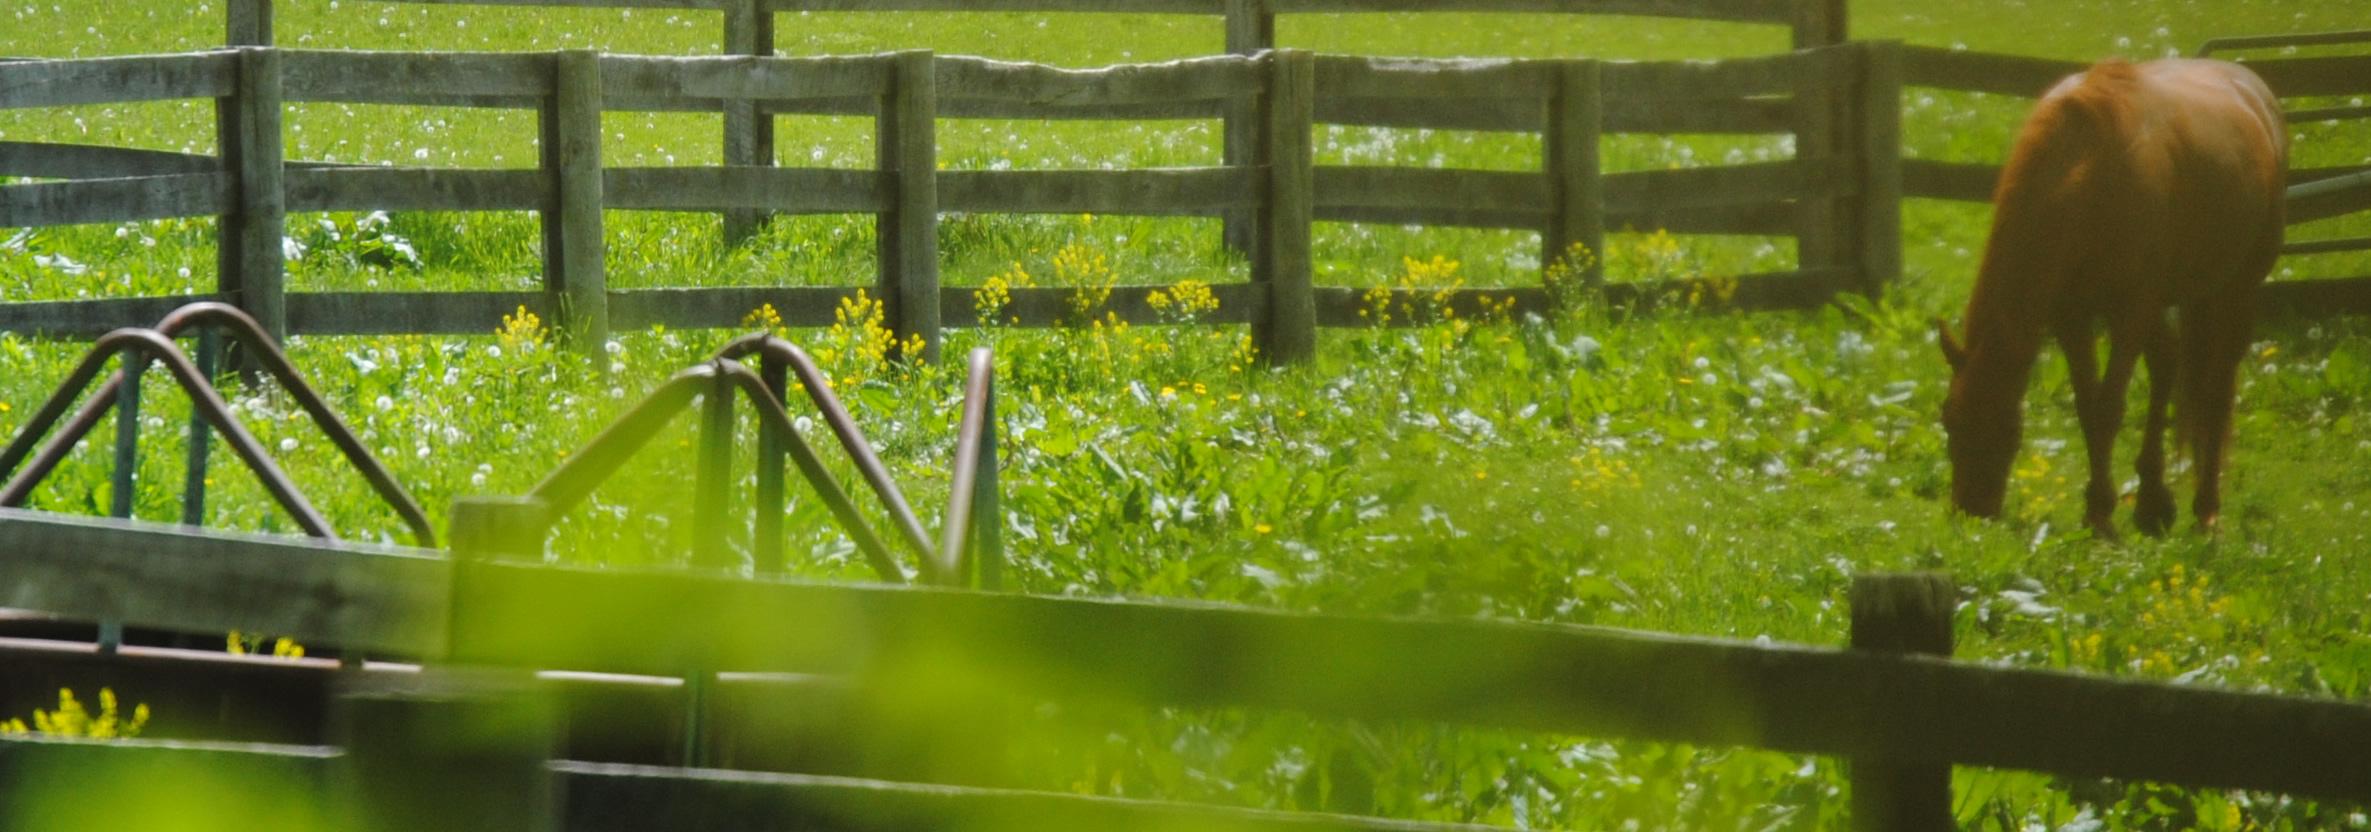 Michigan oakland county highland -  Highland Township Horse In Field Jpg